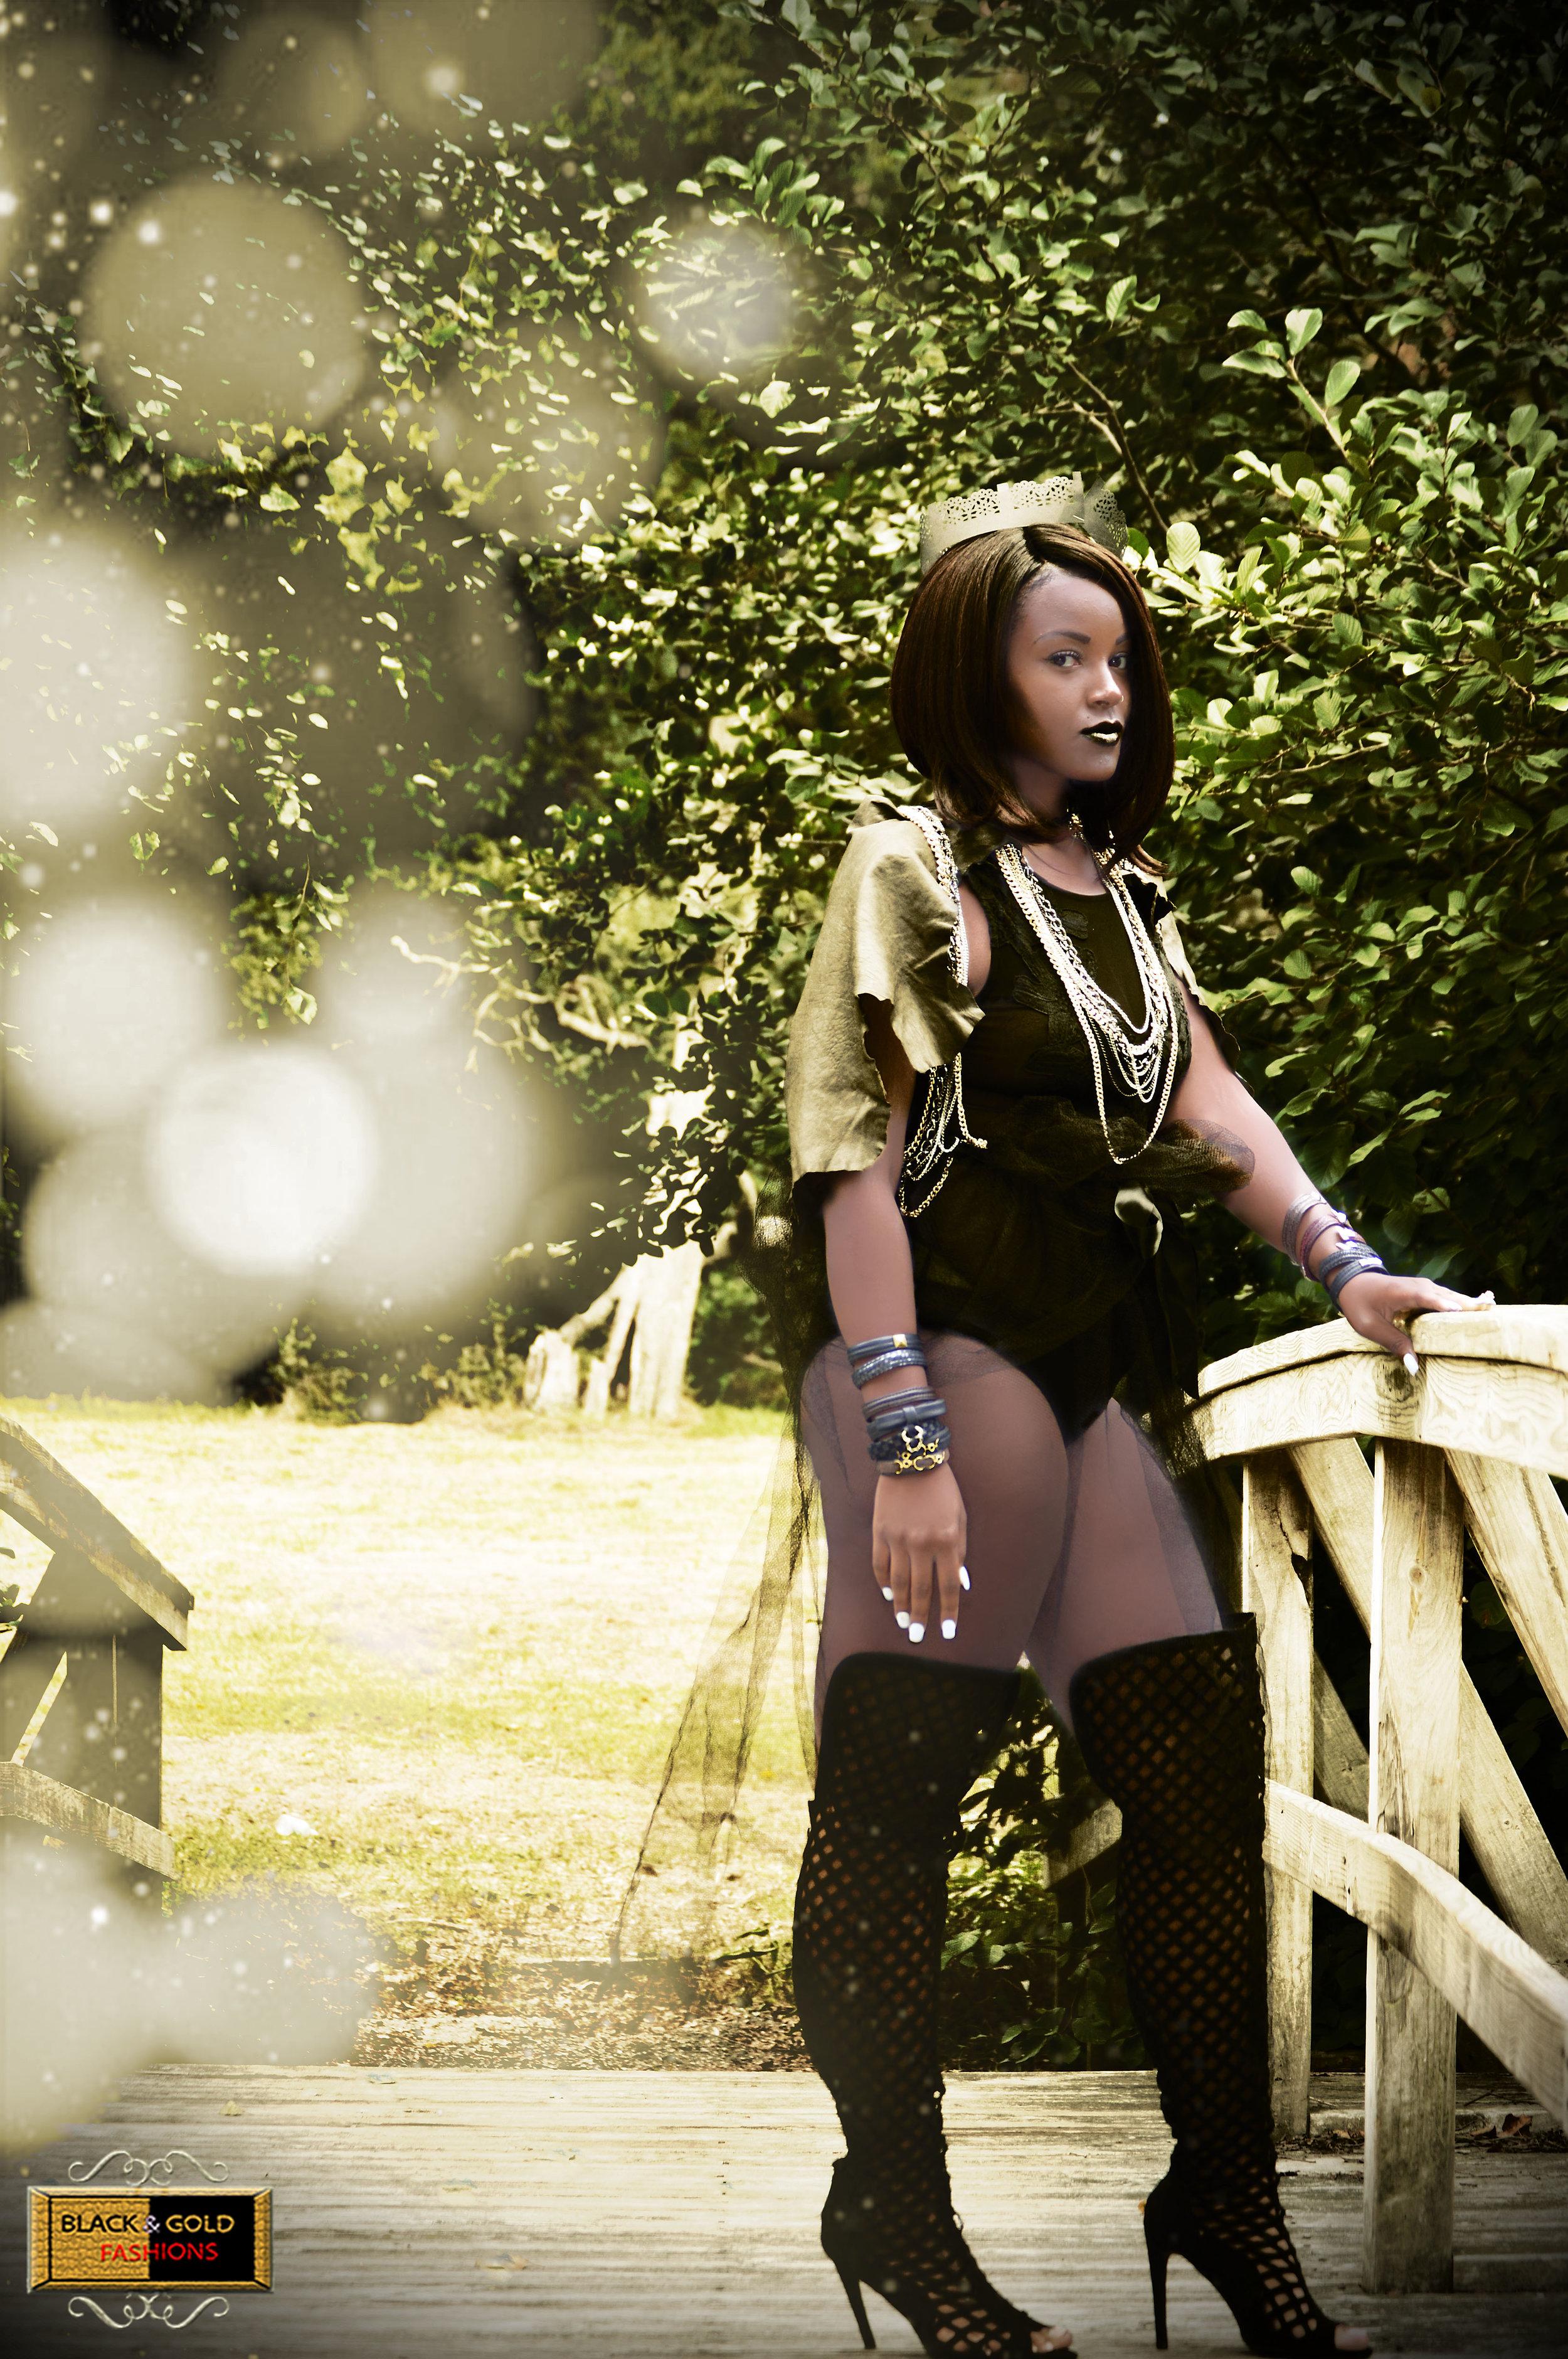 blackandgoldfashions2 warrior-theme.jpg